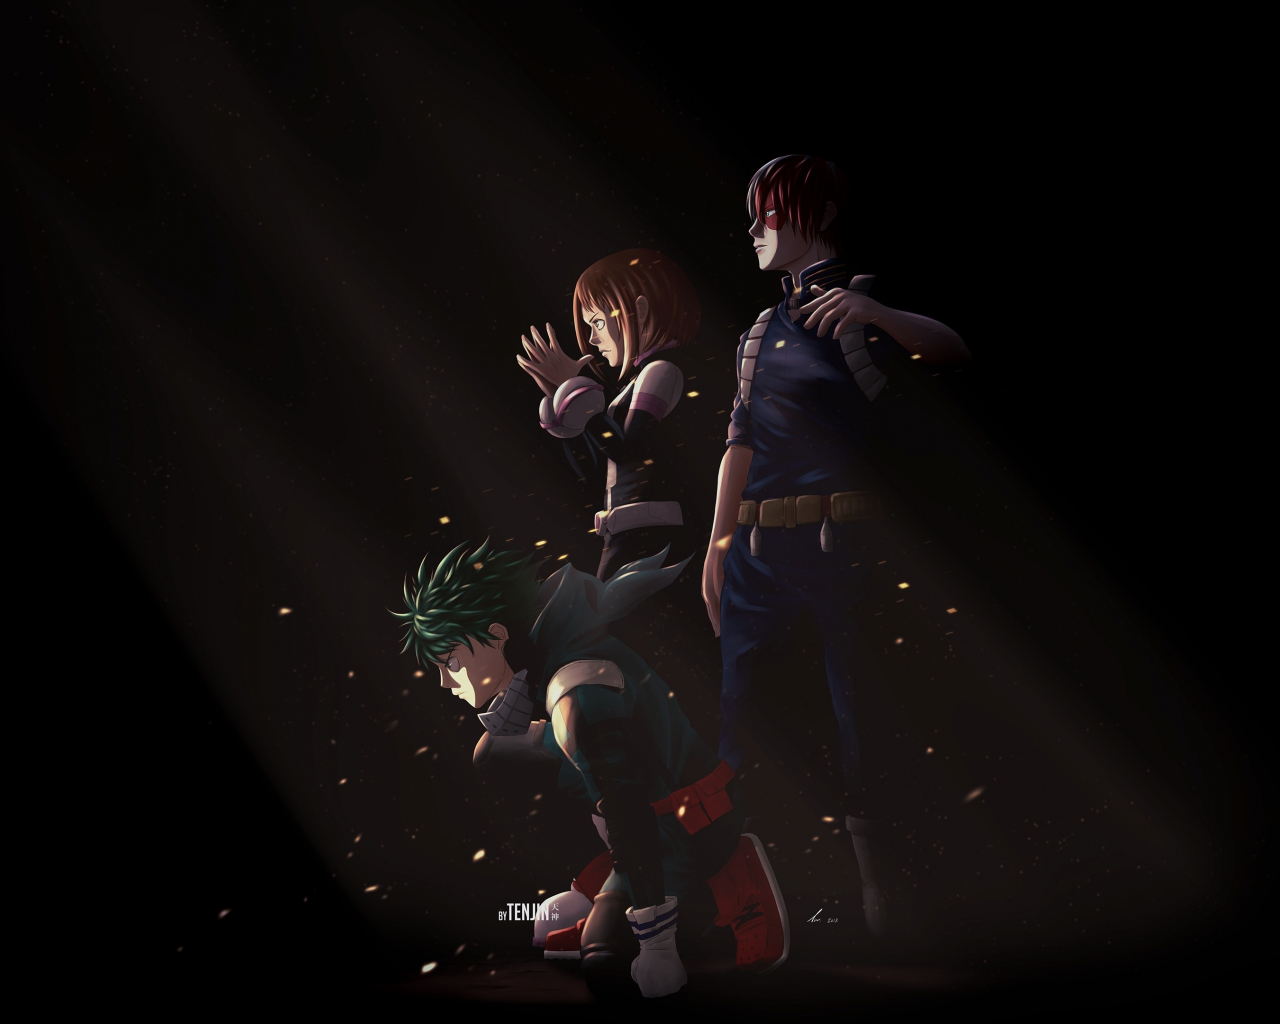 Download 1280x1024 Wallpaper Boku No Hero Academia Dark Artwork